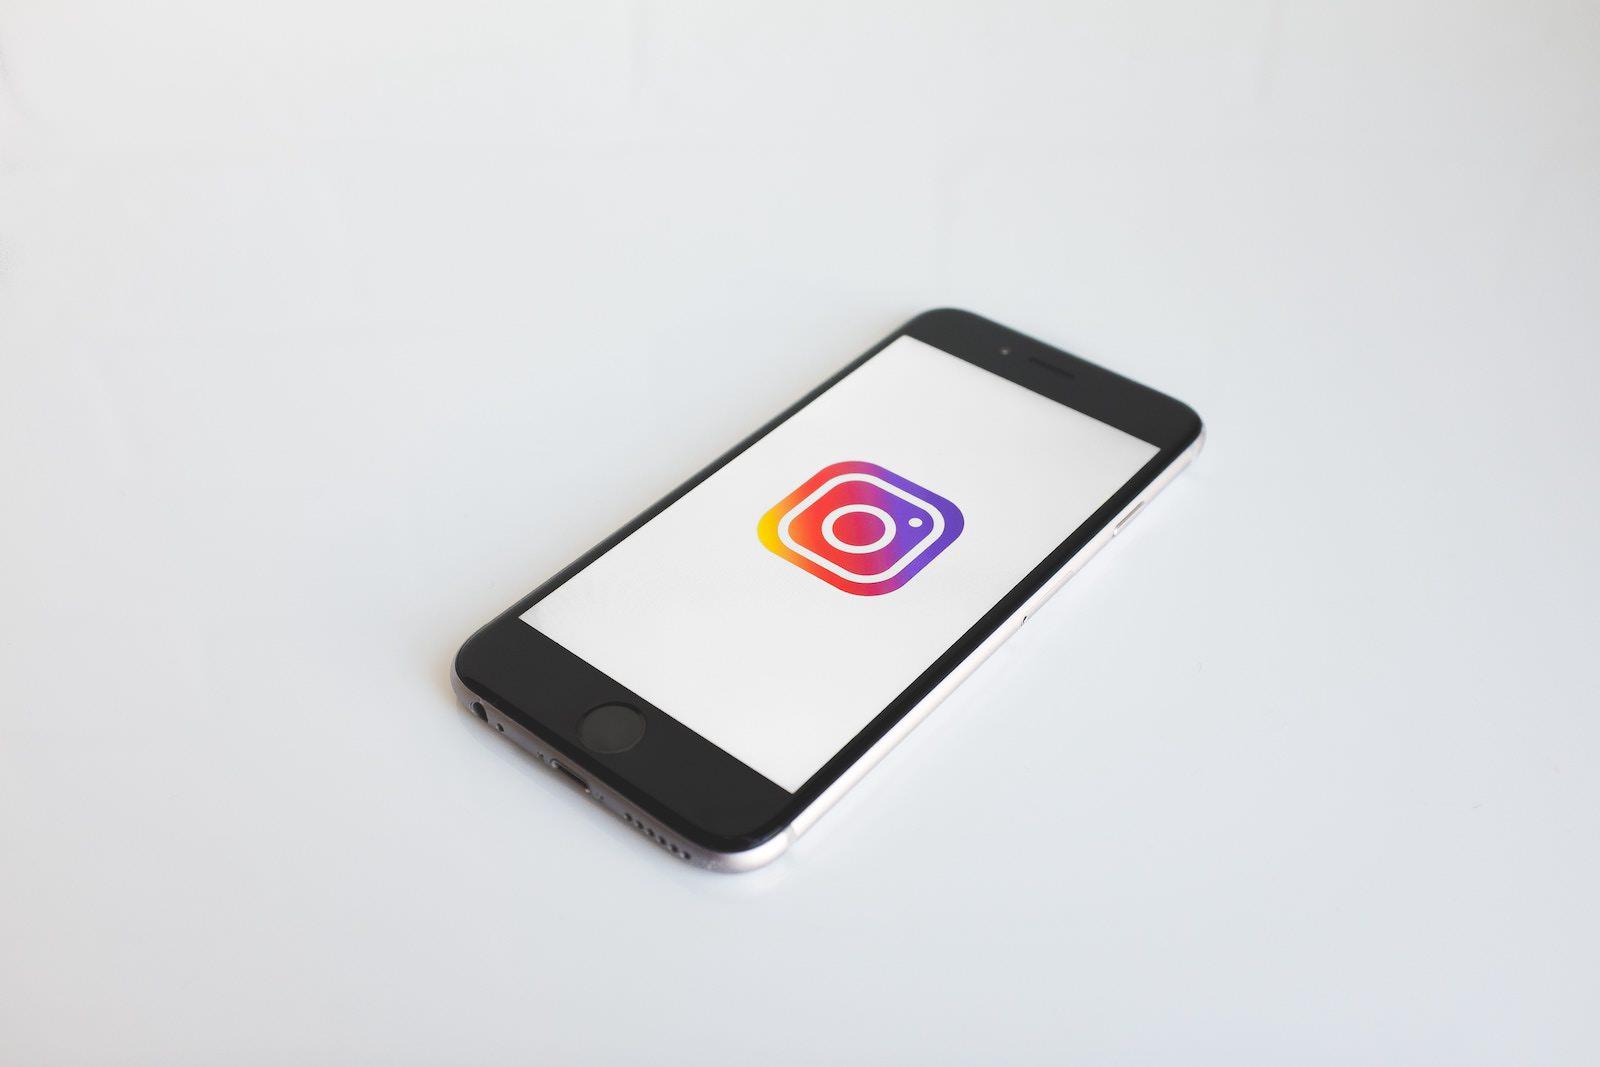 neonbrand-375050-instagram-logo-iphone-unsplash.jpg